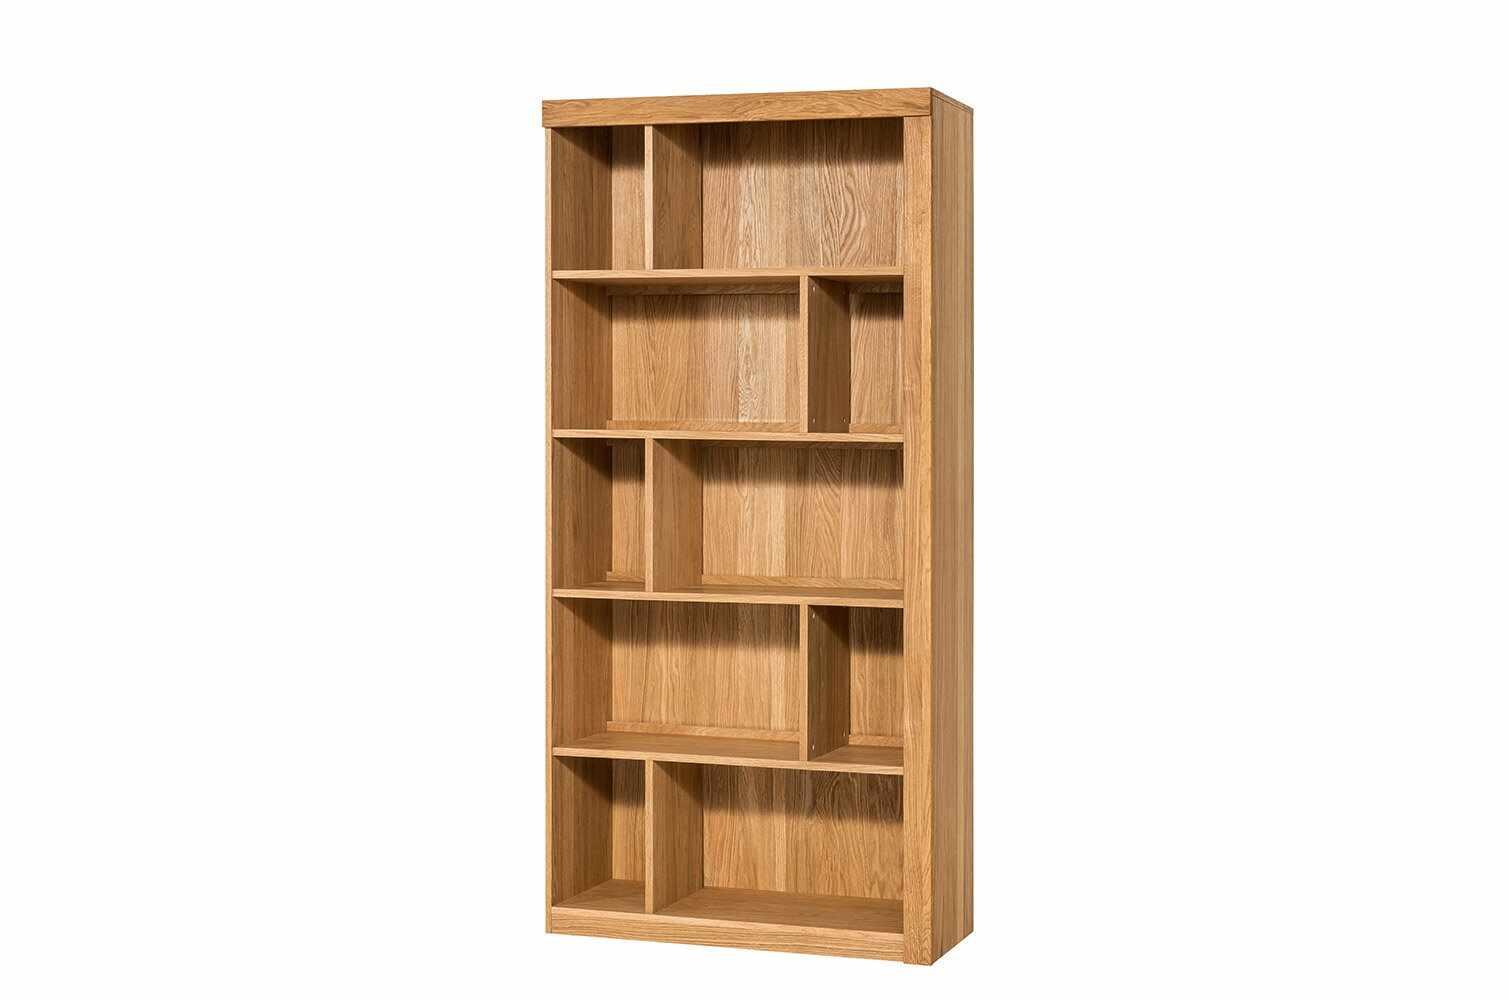 Biblioteca din lemn de stejar si furnir Velle 16 Oak, l95xA42xH202 cm la pret 2748 lei